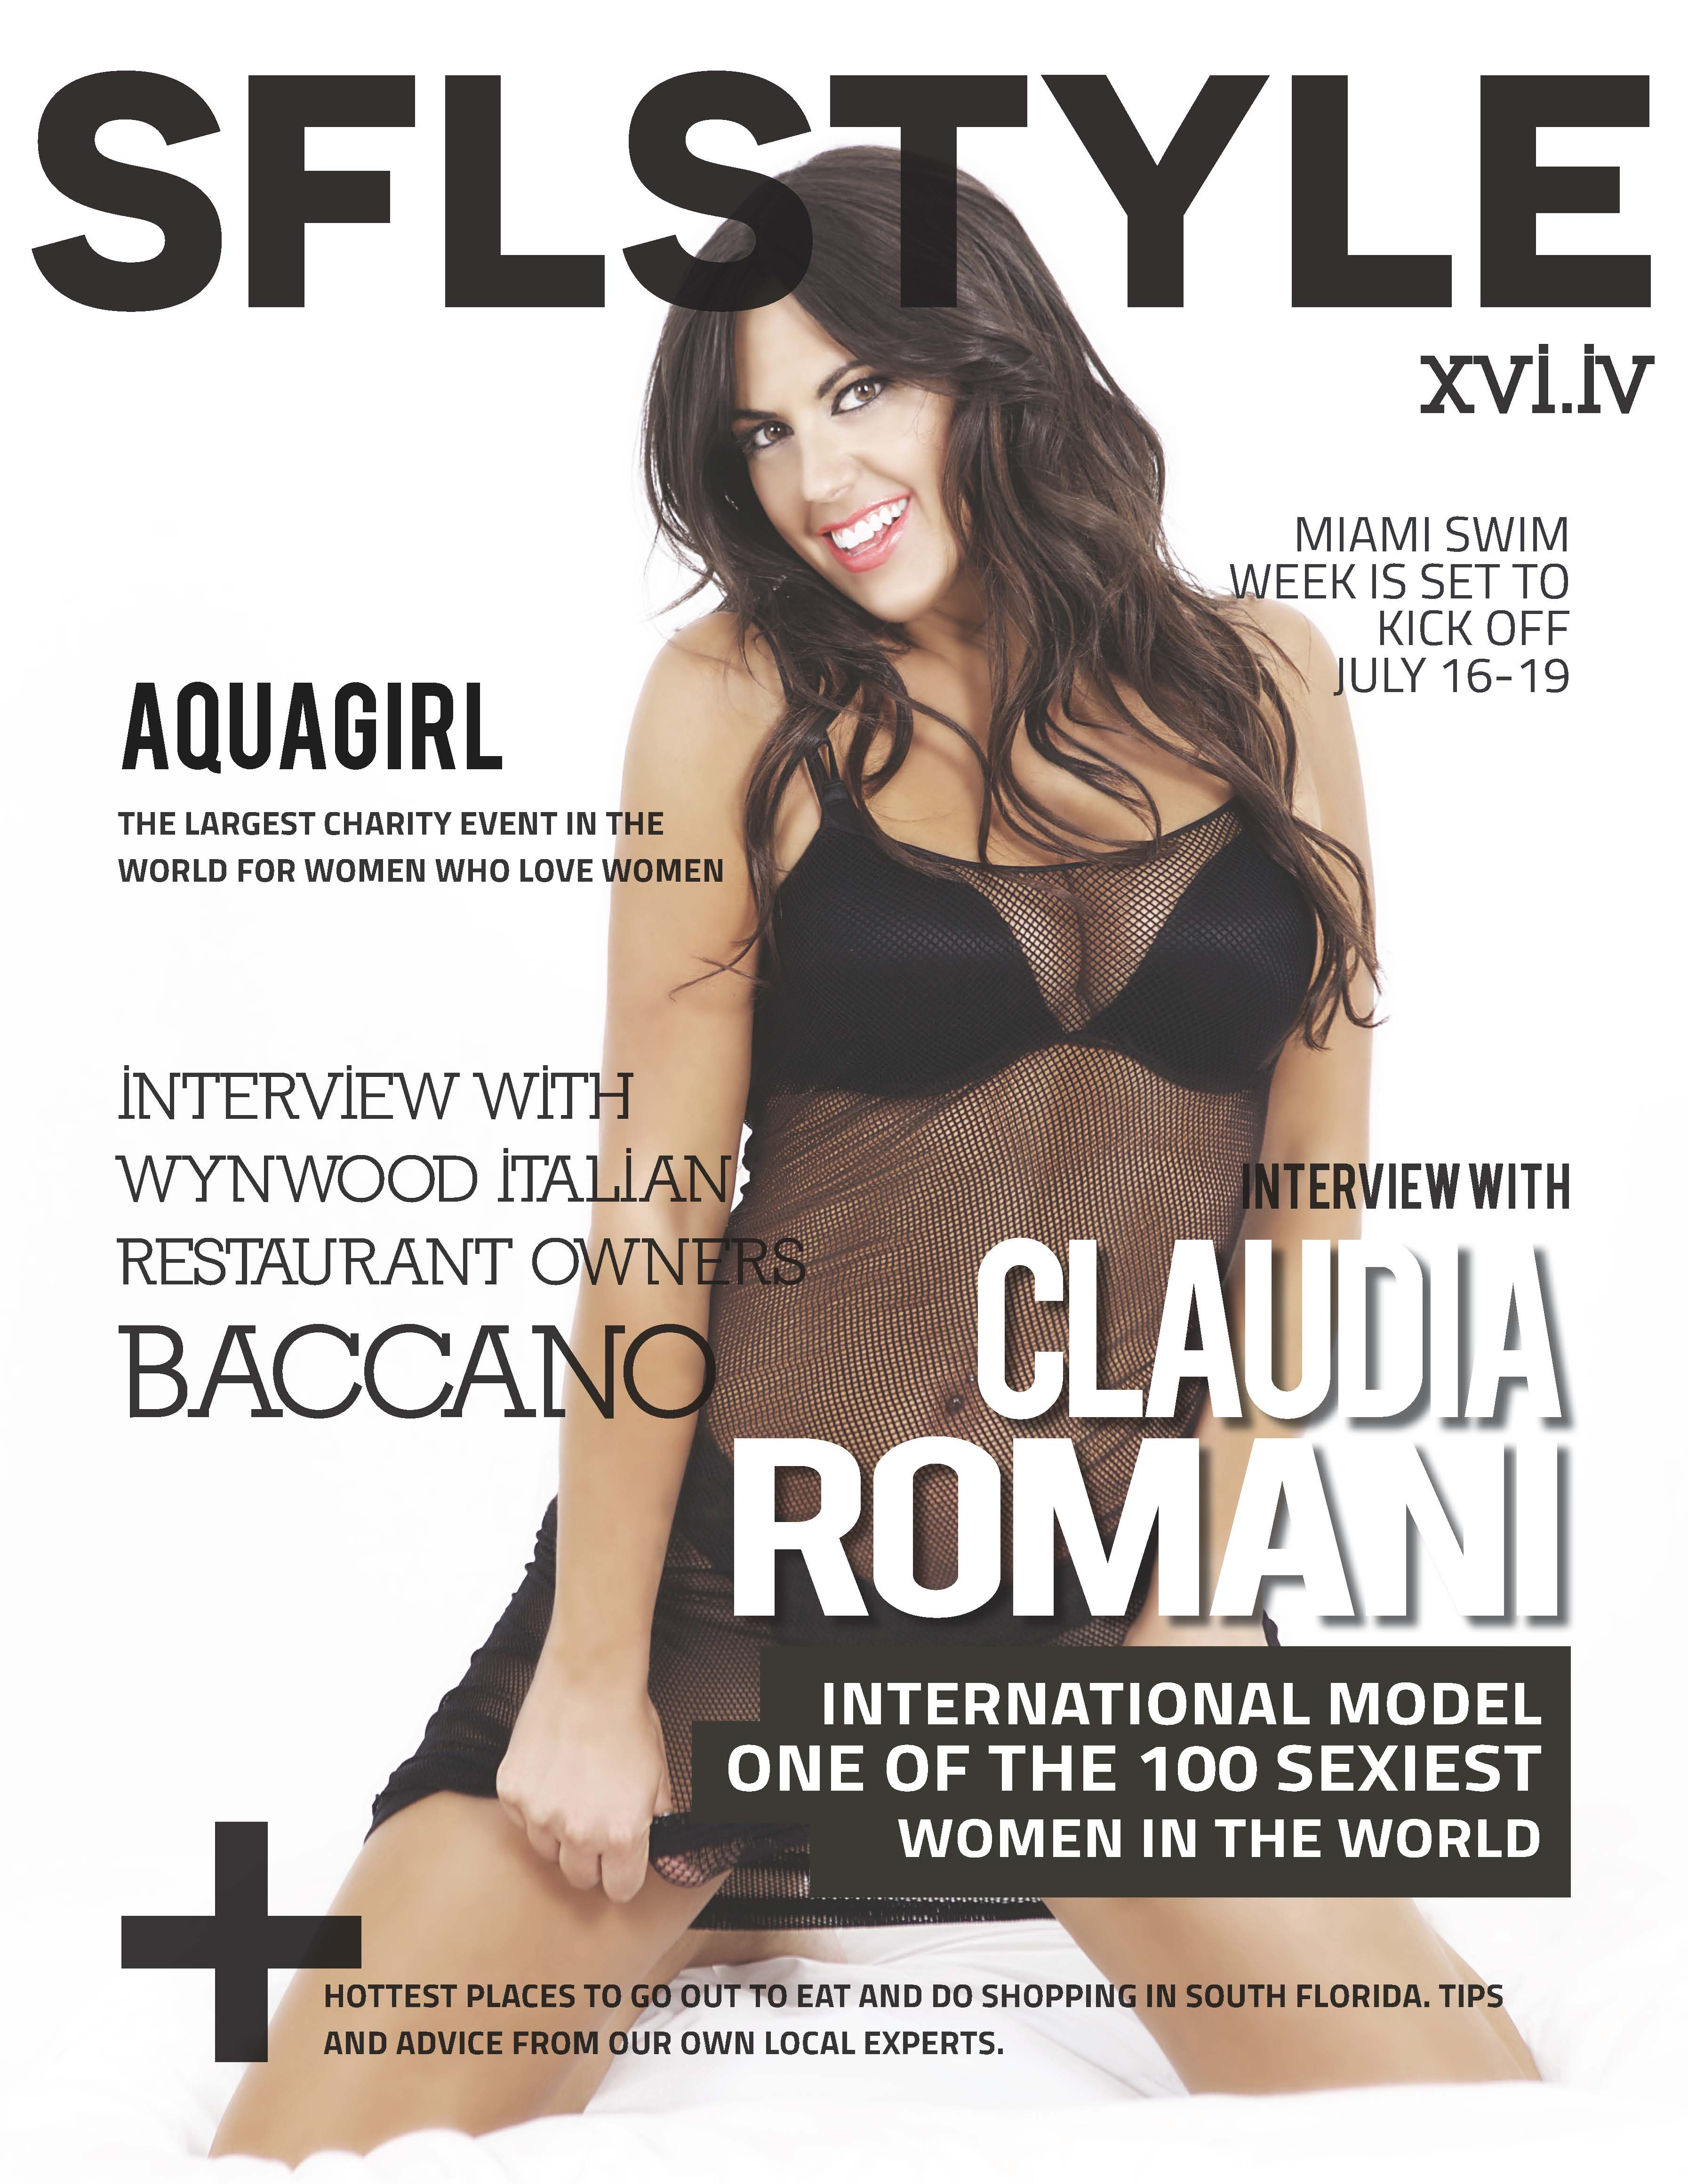 sfl-style-magazine-sfl-style-magazine_Page_01